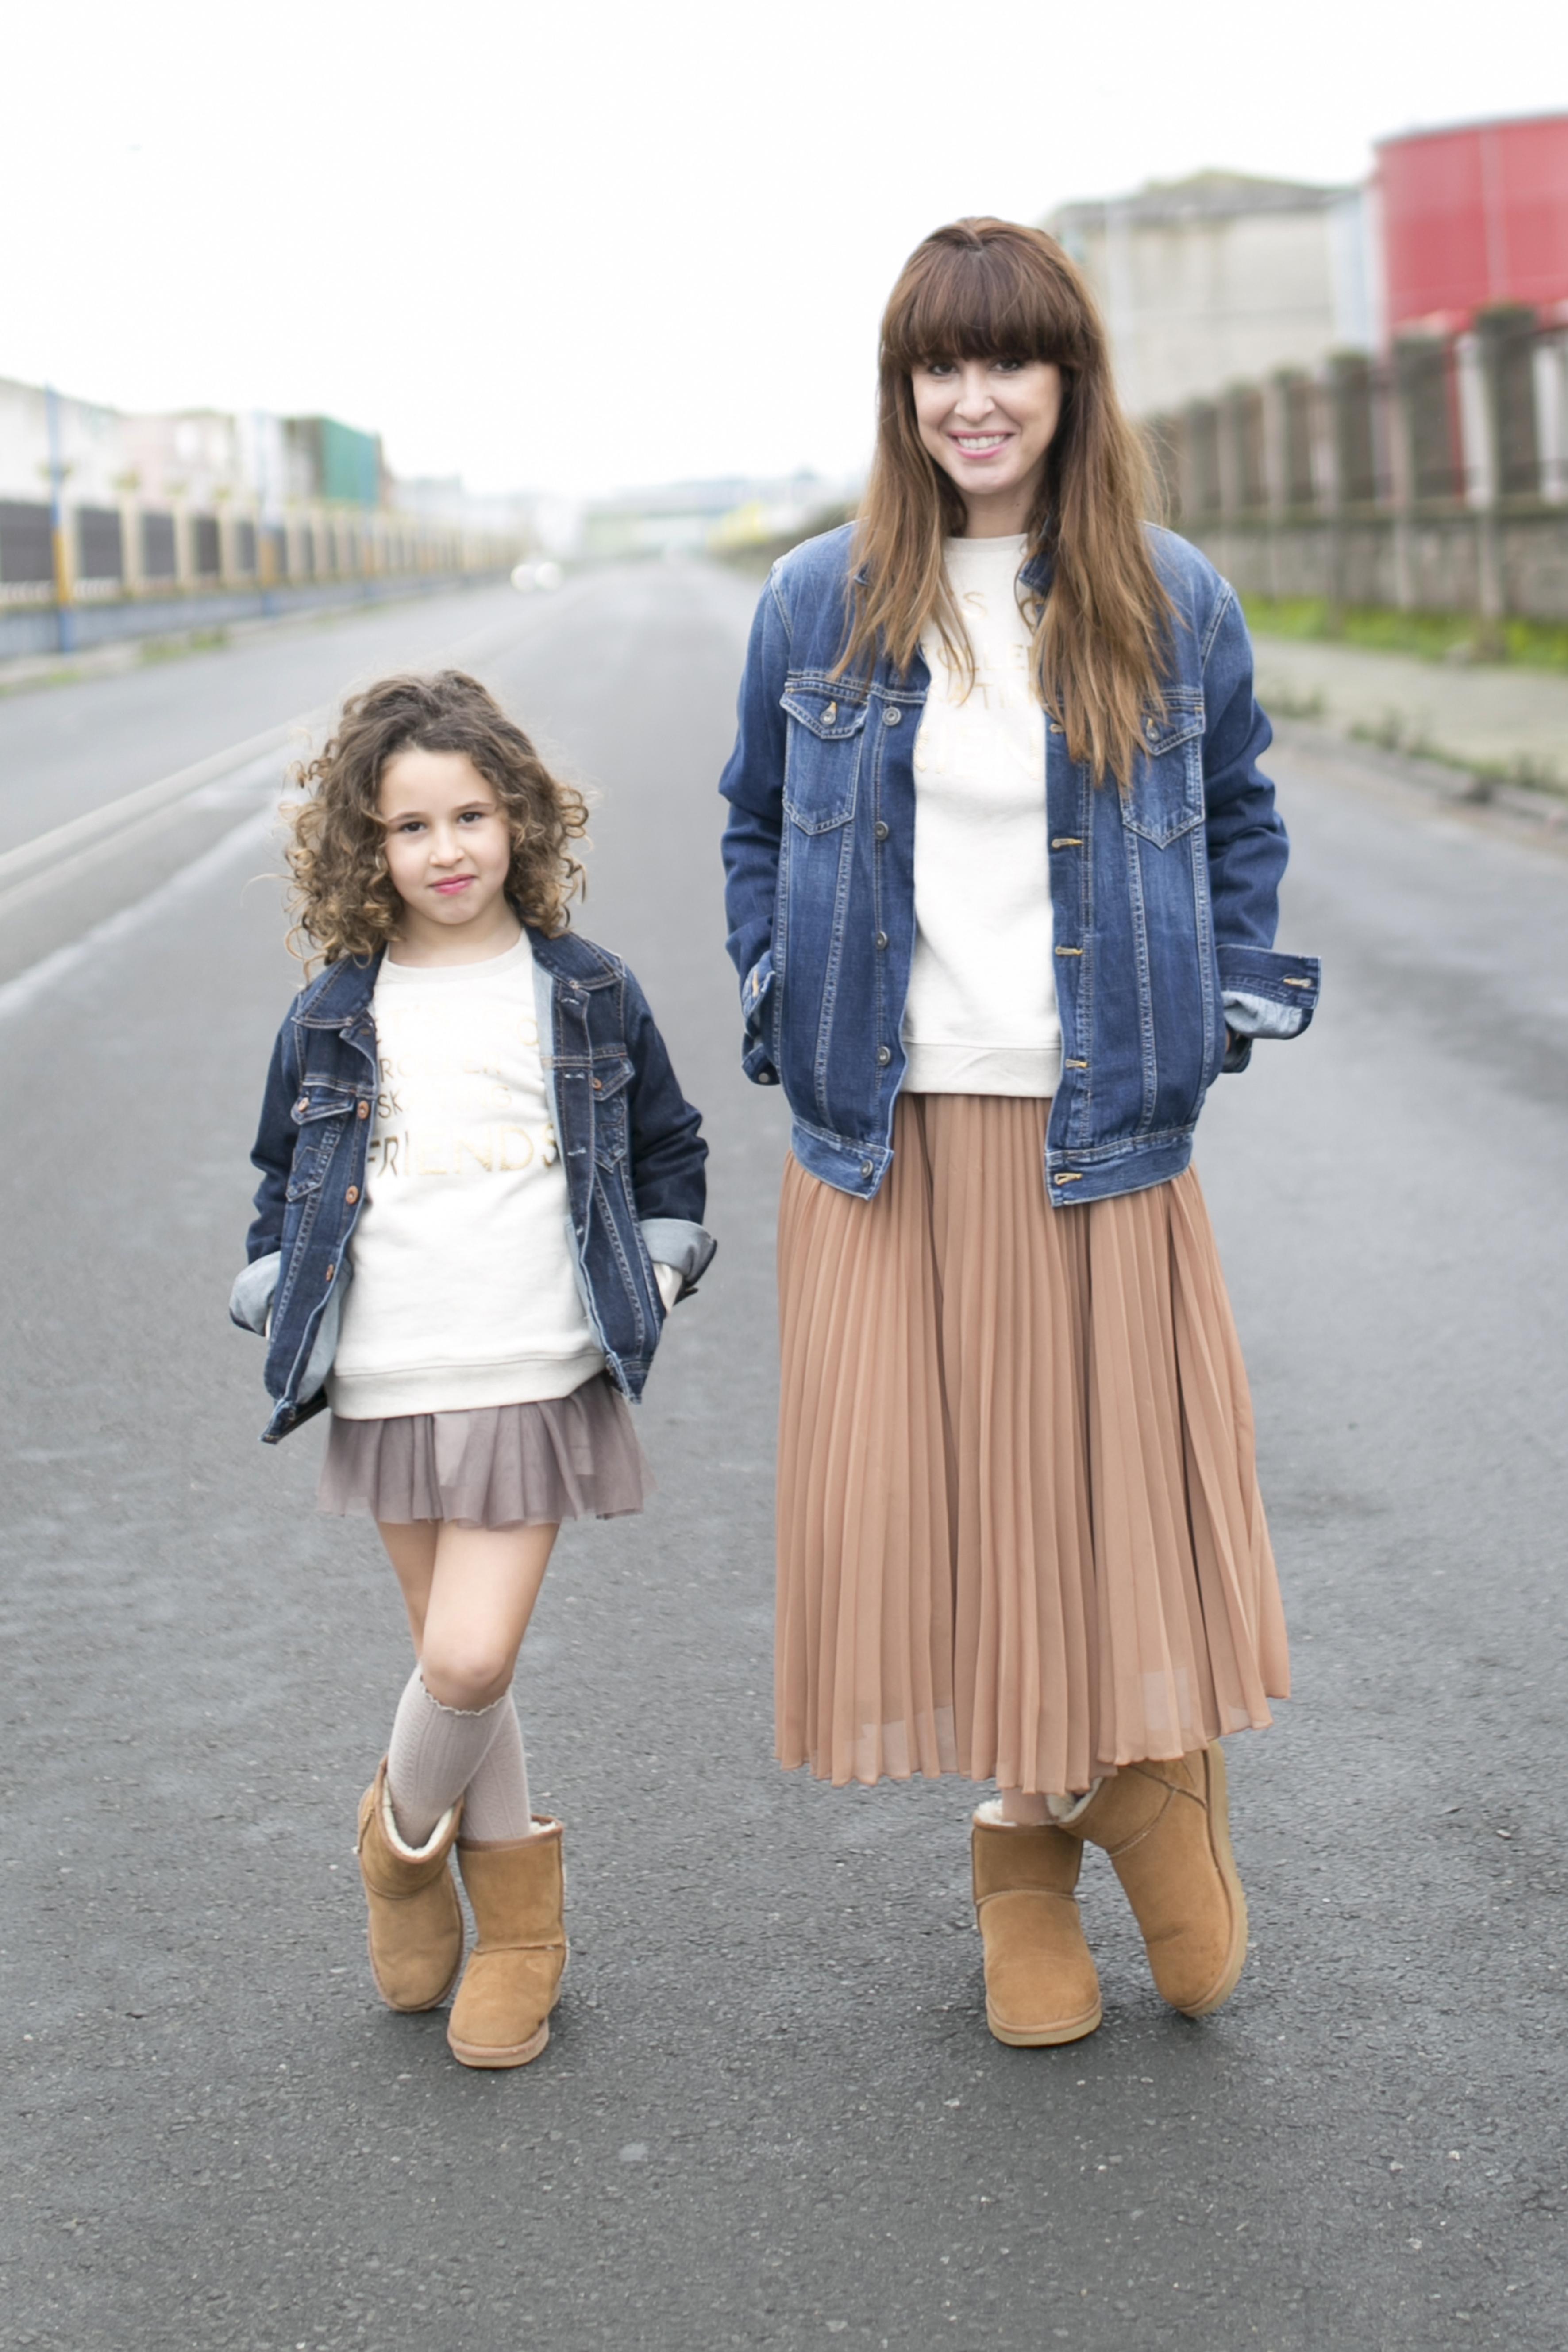 Ugg- coruña- street style- descalzaporelparque-Ugg look-denim-pepejeans-minime-calle-moda-fashion-madre e hija-zara- zarakids-